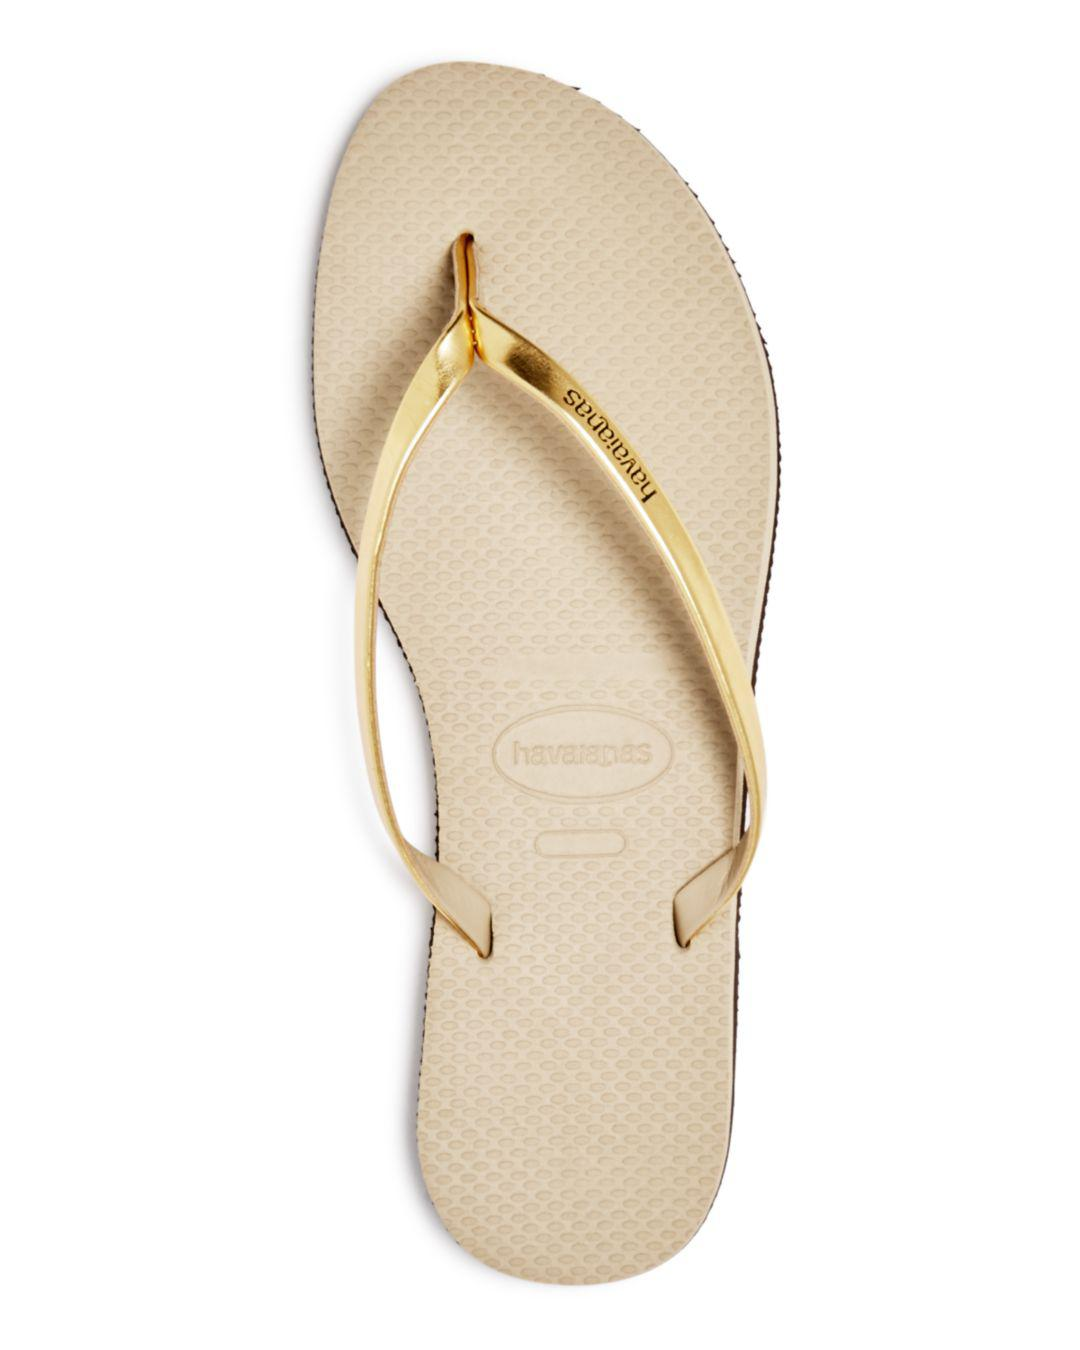 69049516f Lyst - Havaianas You Metallic Slim Flip-flops in Natural